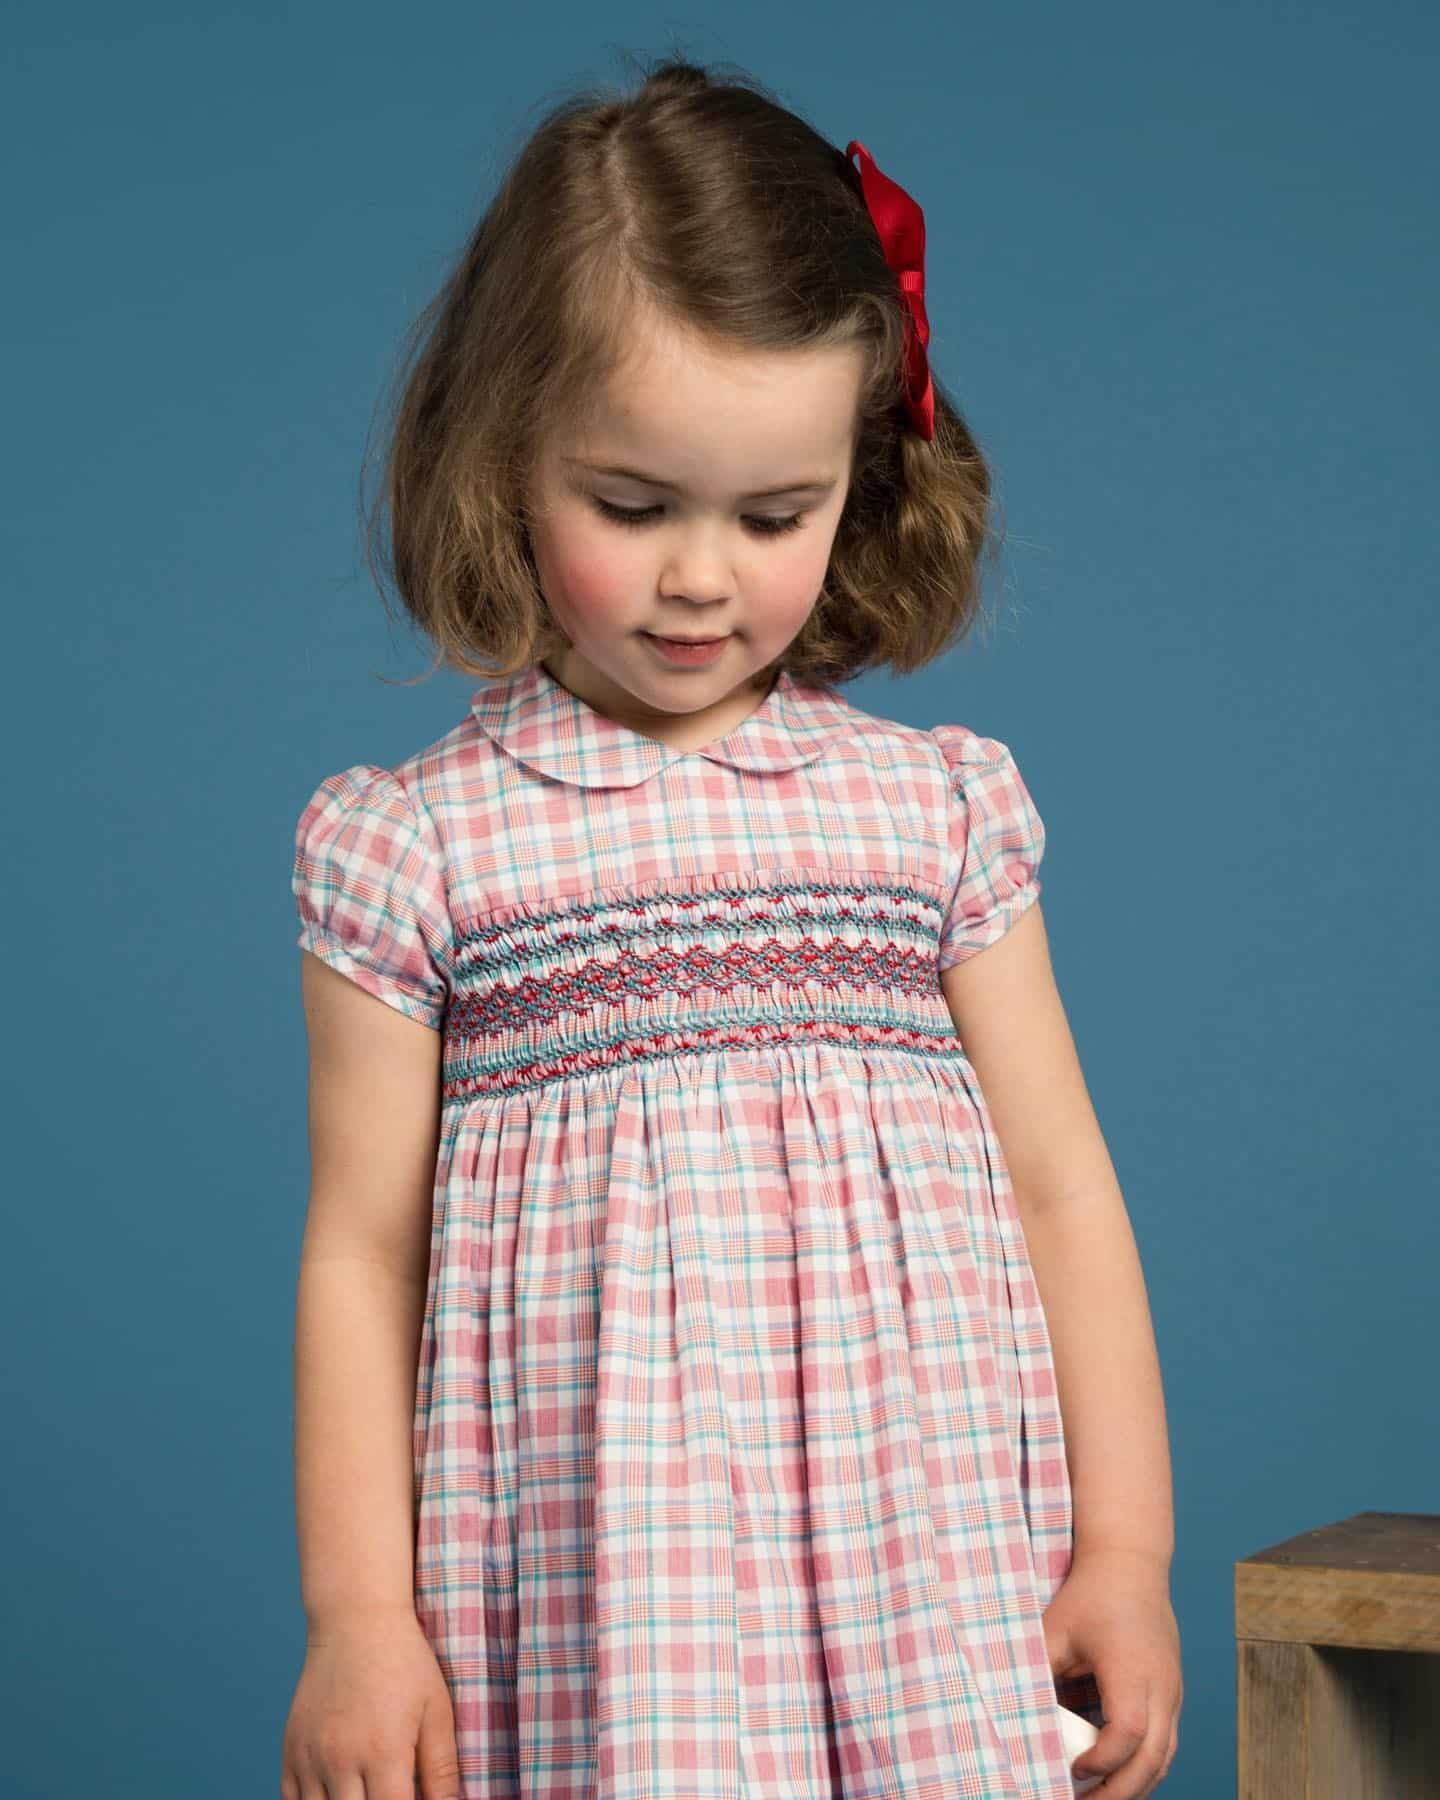 🧡️@bonitatokyo︎ONLINE STOREhttps://bonitatokyo.com#bonitatokyo #amaiakids #アマイアキッズ #シャーロット王女 #キャサリン妃 #イギリス王室 #出産祝い #出産祝いギフト #女の子服 #むすめふく #刺繍